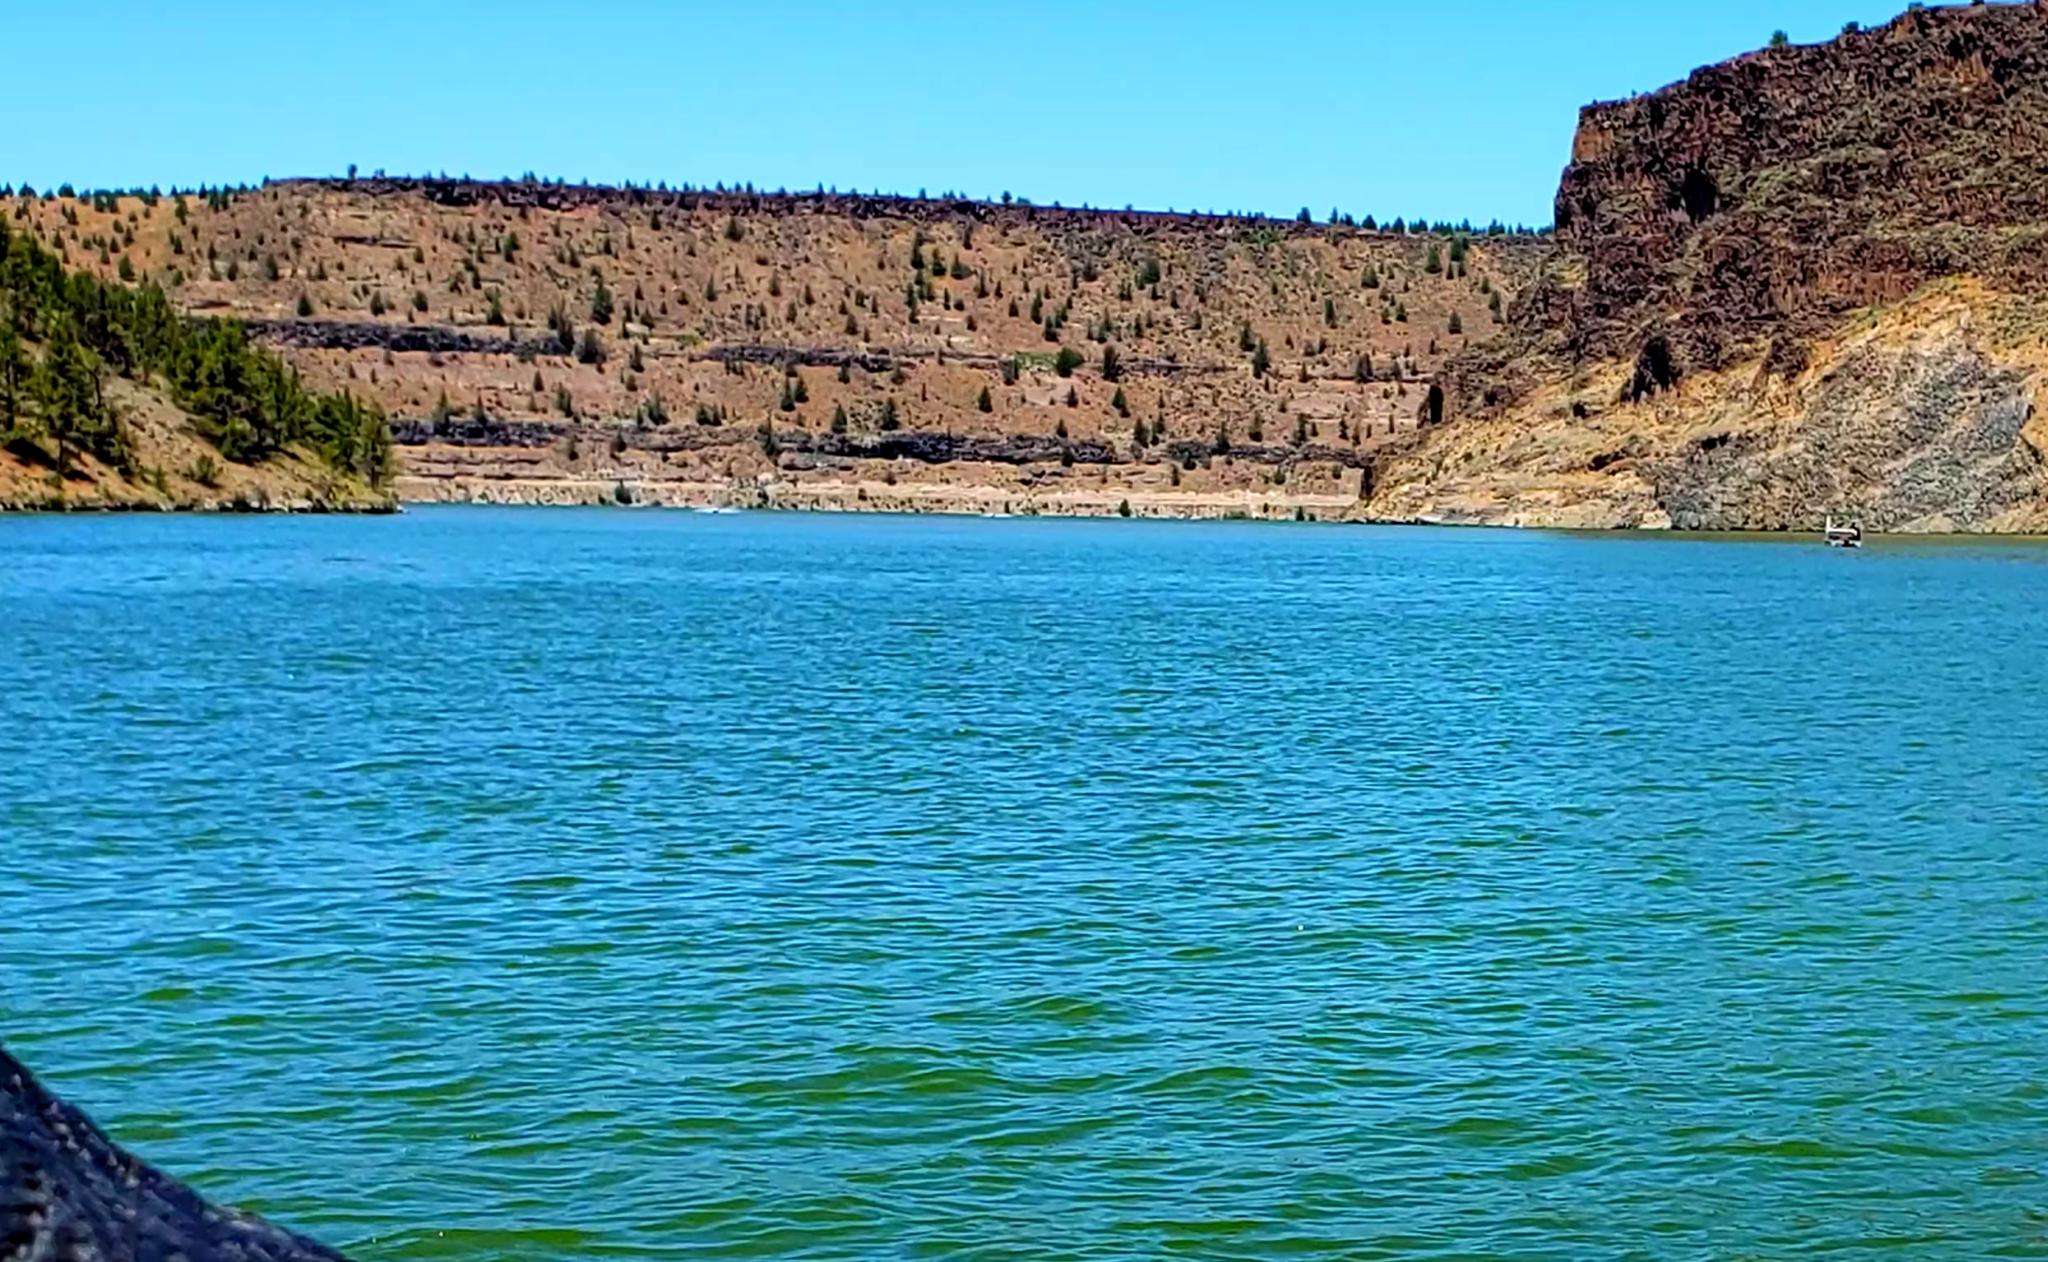 Lake-Billy-Chinook-Lake-Fishing-Report-Guide-Oregon-05